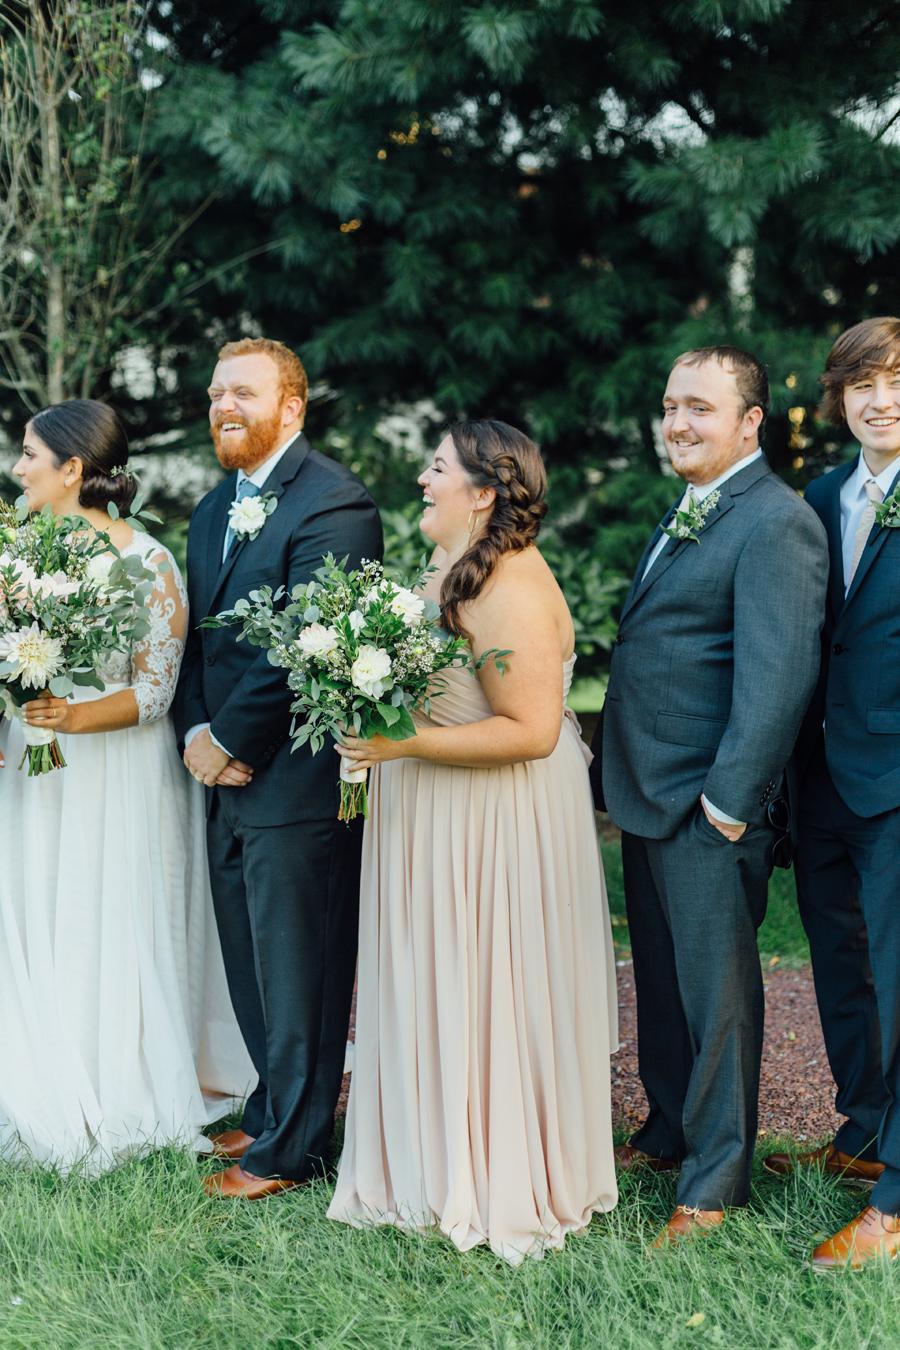 the-inn-at-leola-wedding-lancaster-pennsylvania-wedding-photographer-rebeka-viola-photograhy (70).jpg